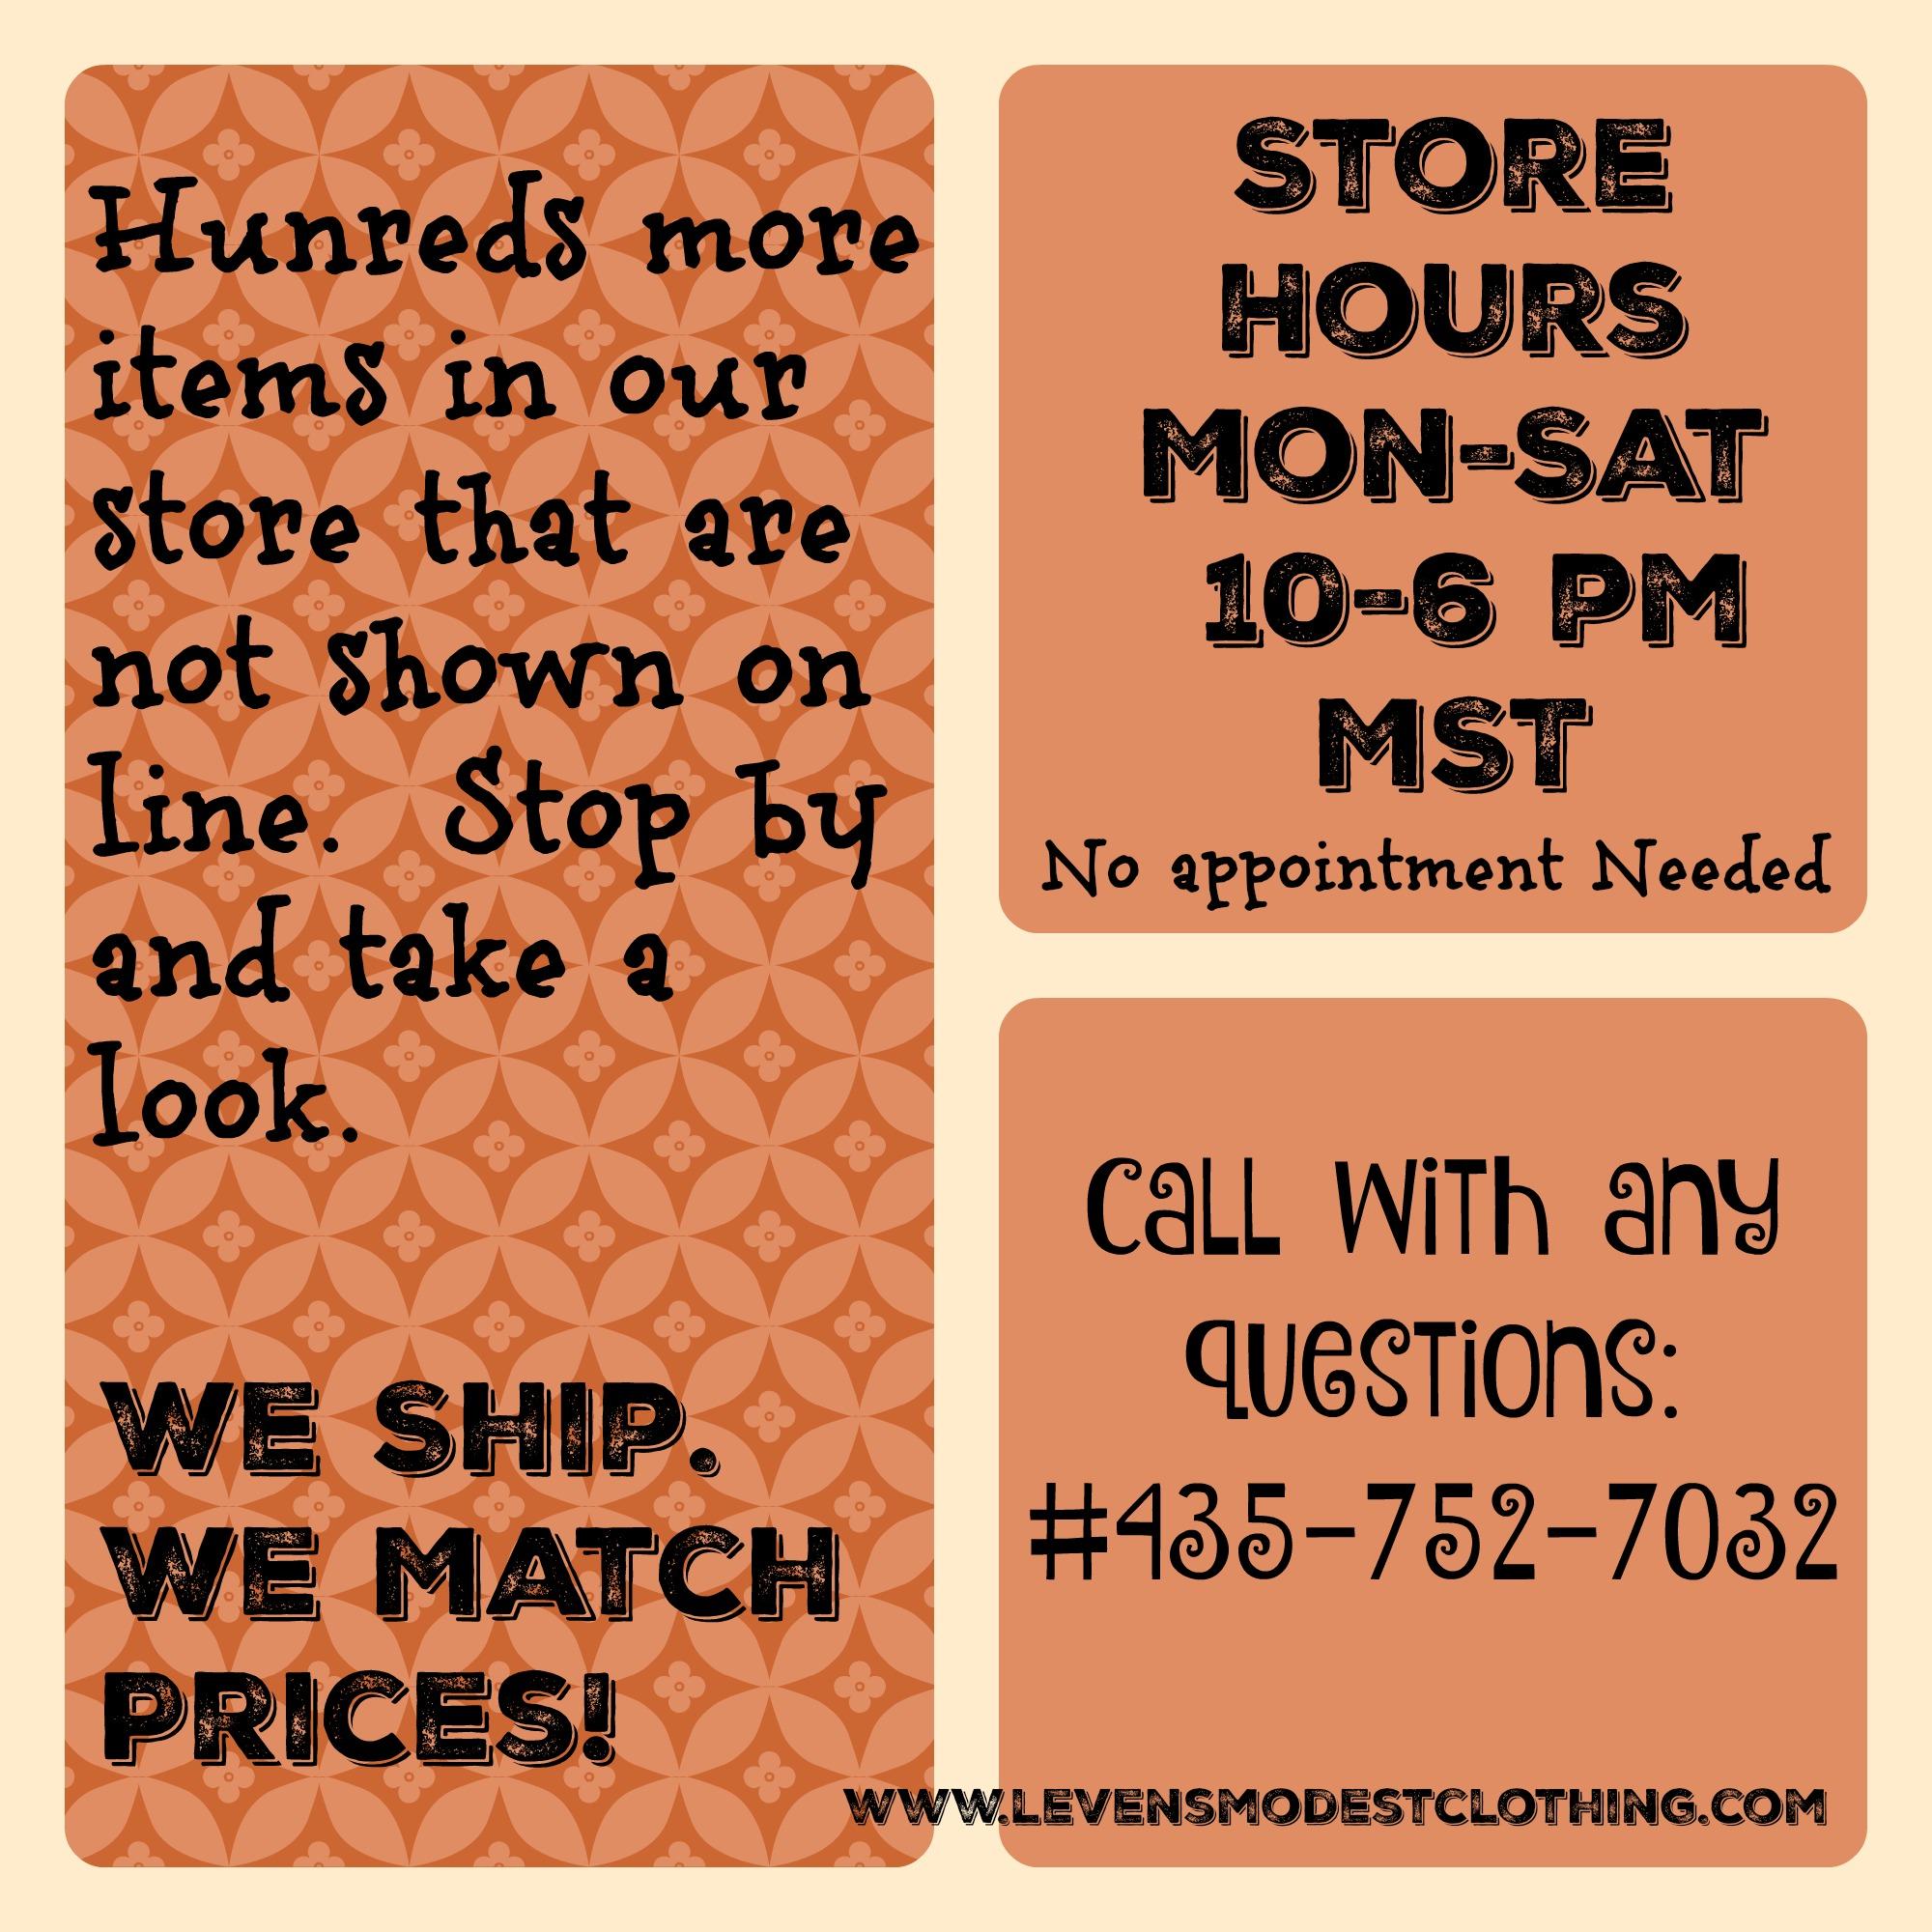 Store Info.